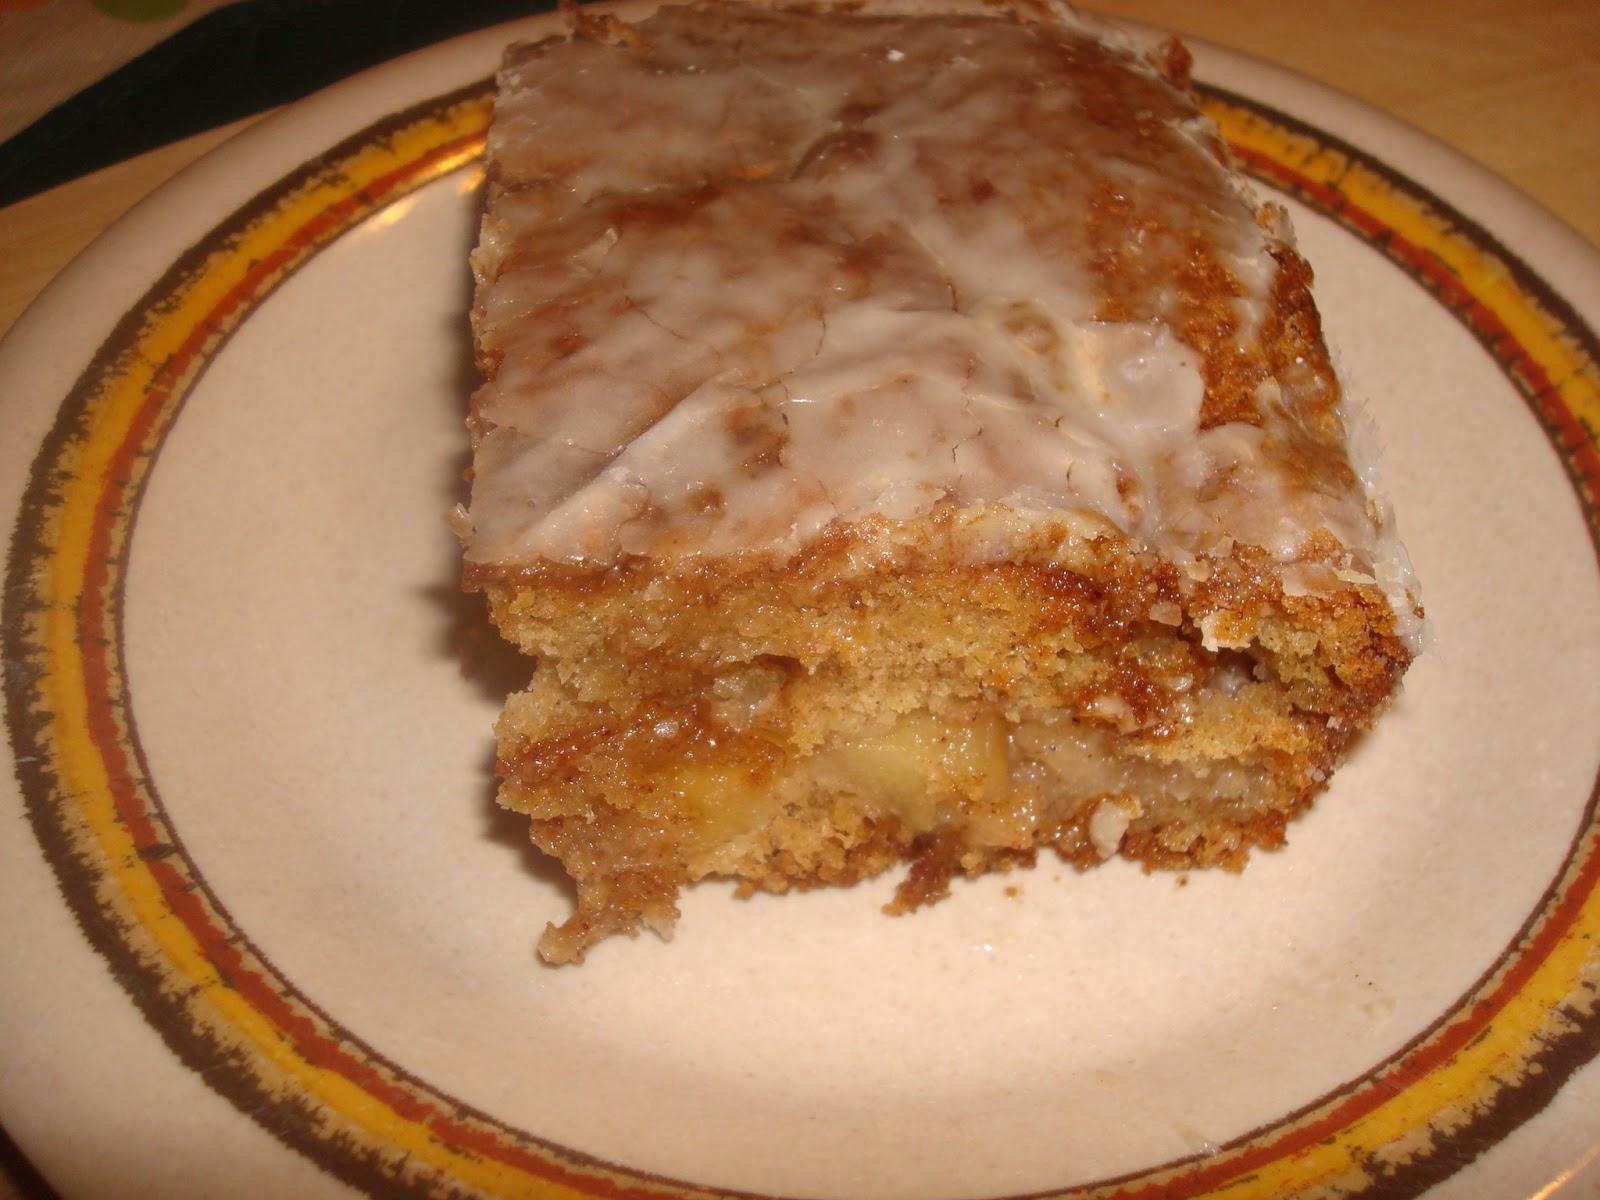 Pin Louisiana Crunch Cake Cake on Pinterest